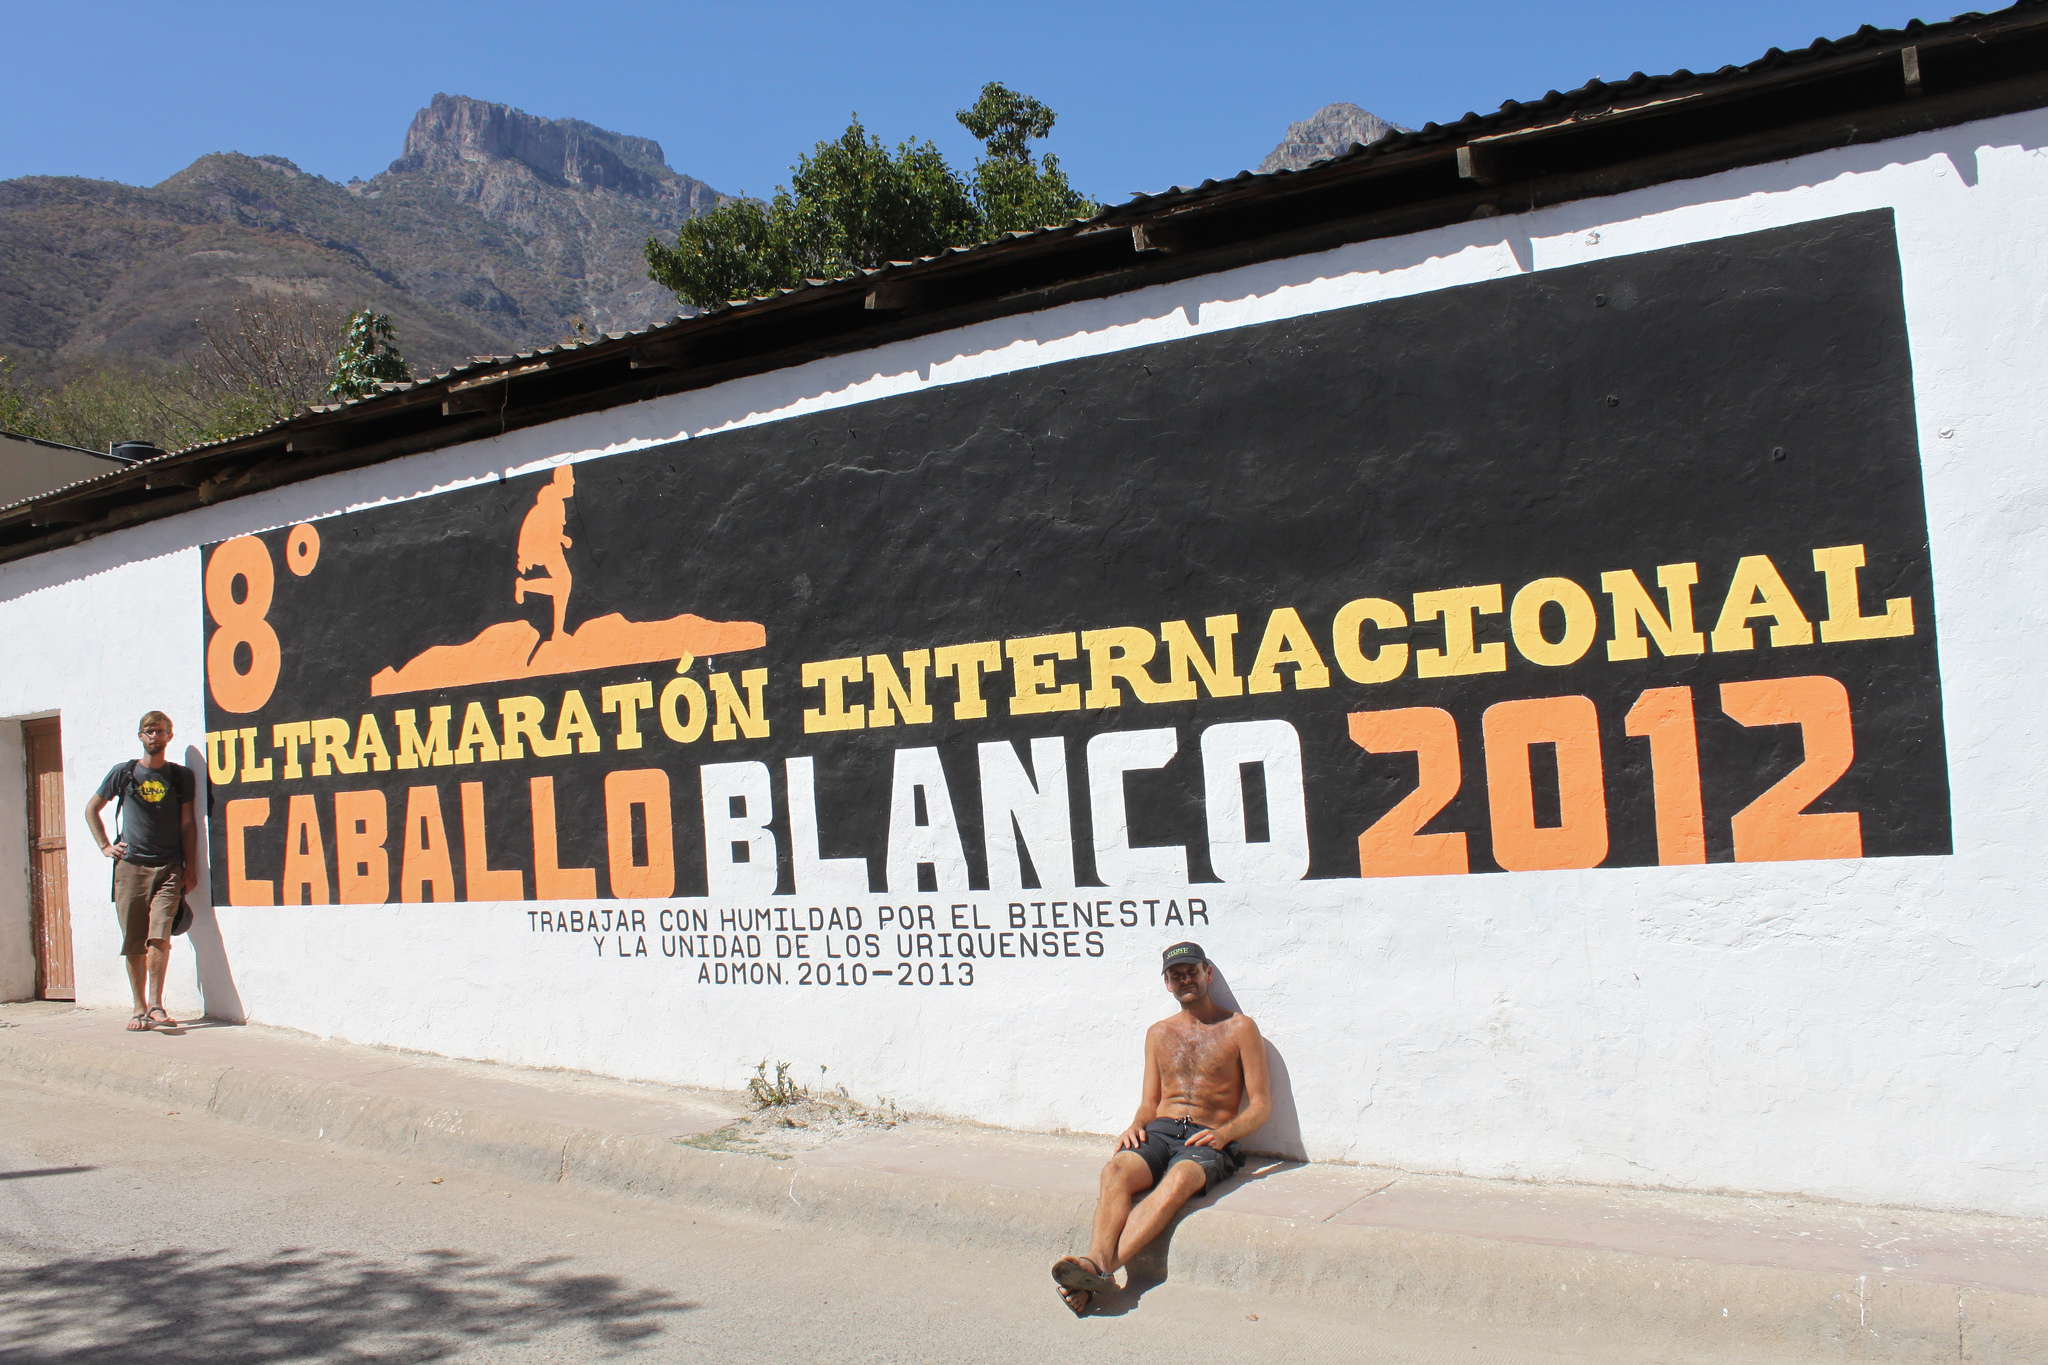 The Caballo Blanco Ultra Marathon is one of the region's best known | © Eli Duke/Flickr